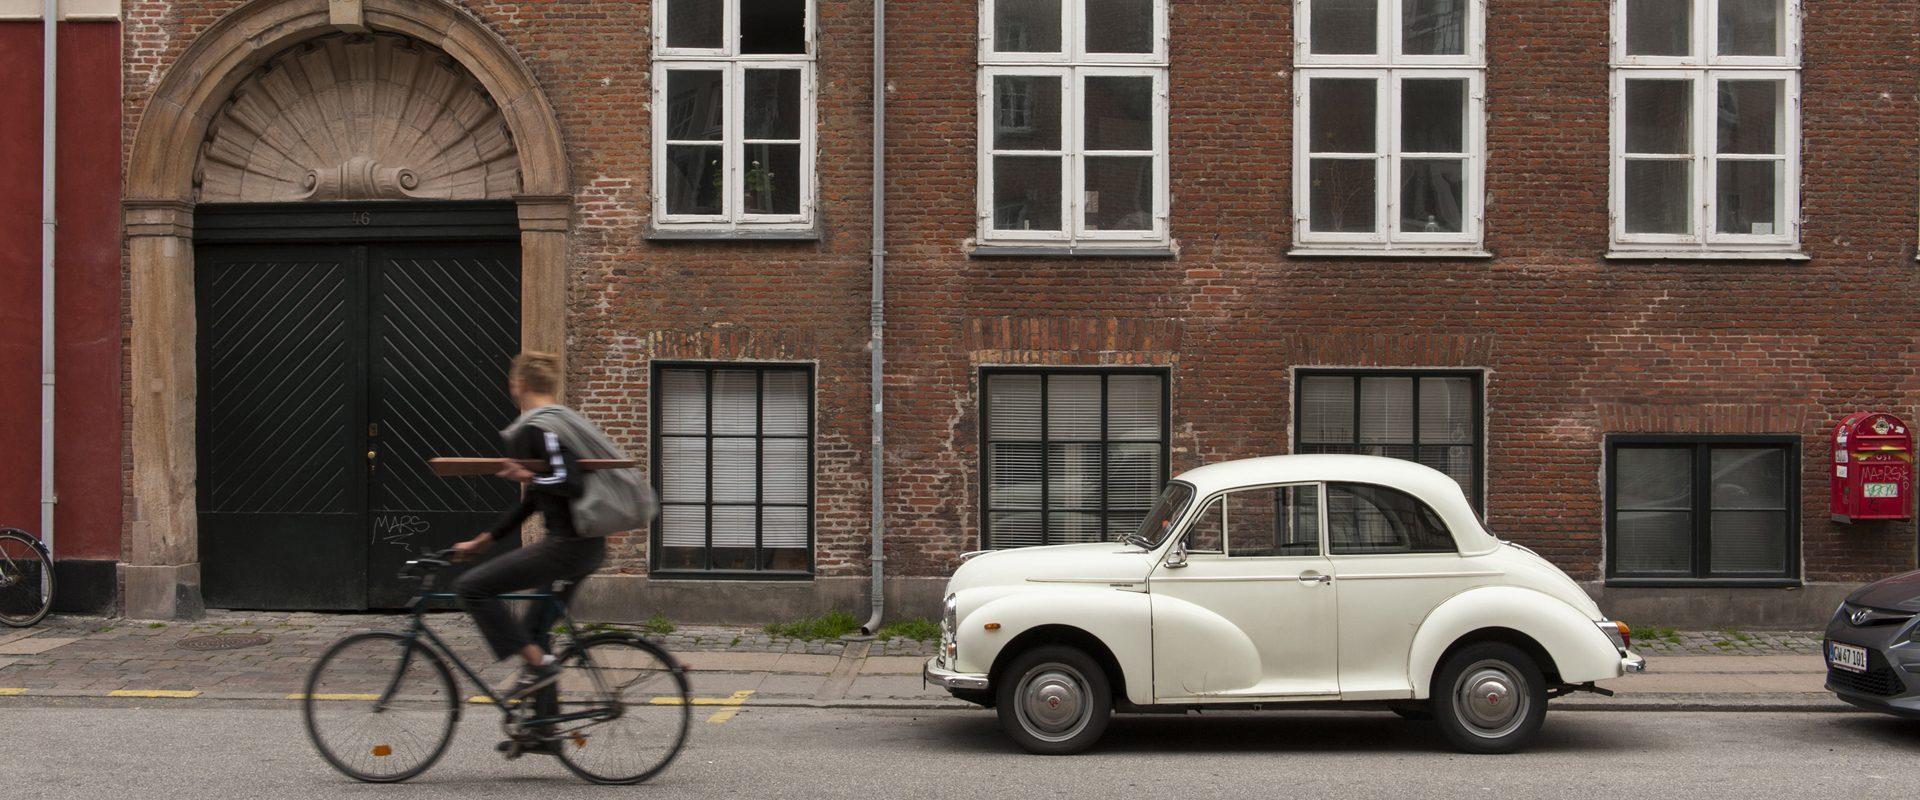 Dänemark, Kopenhagen. Foto: Erik-Jan Ouwerkerk